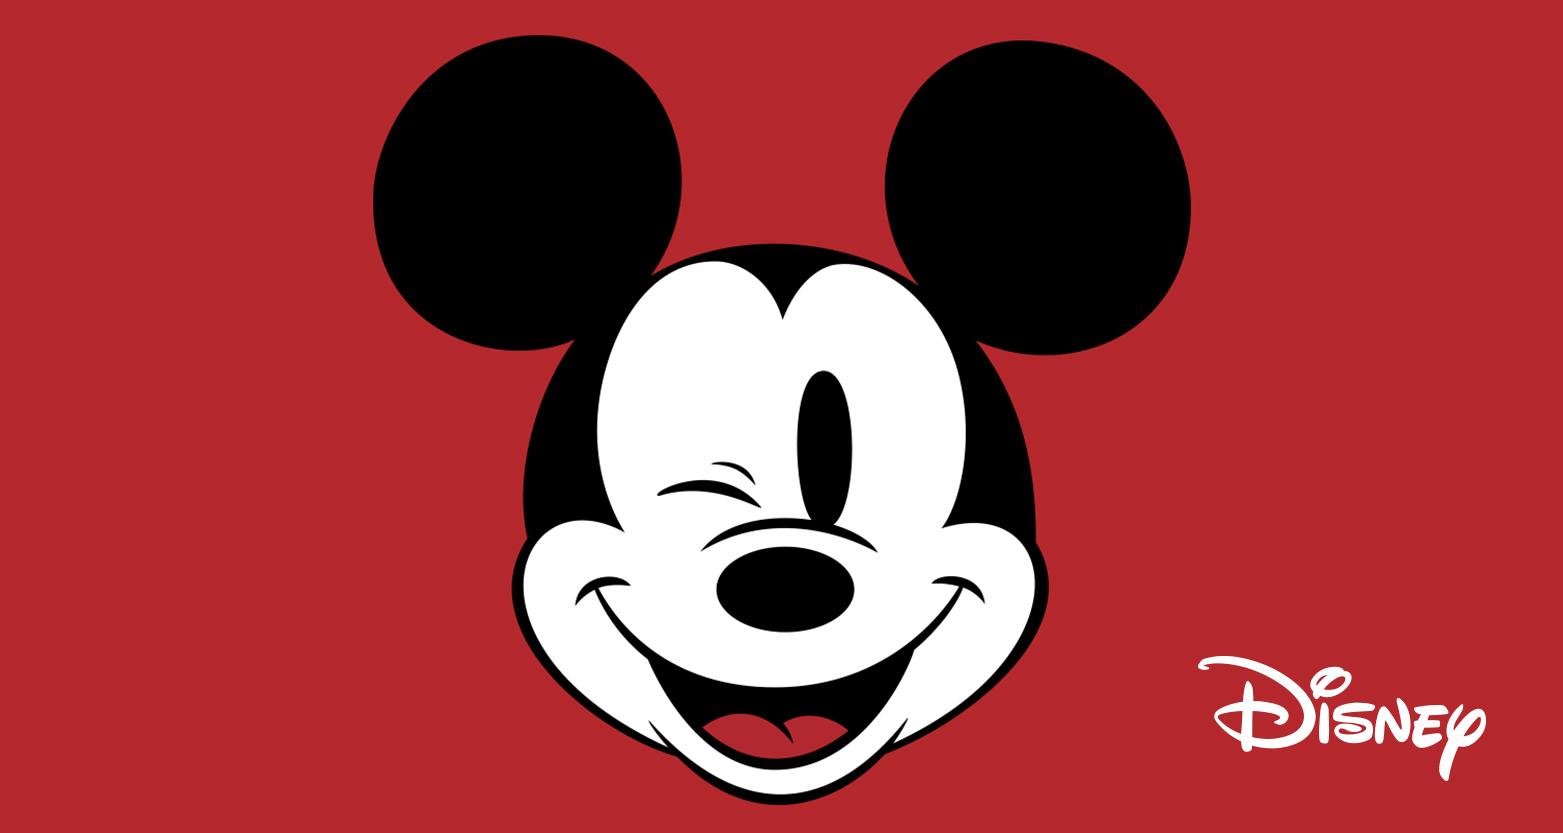 Chuột Mickey của Disnep